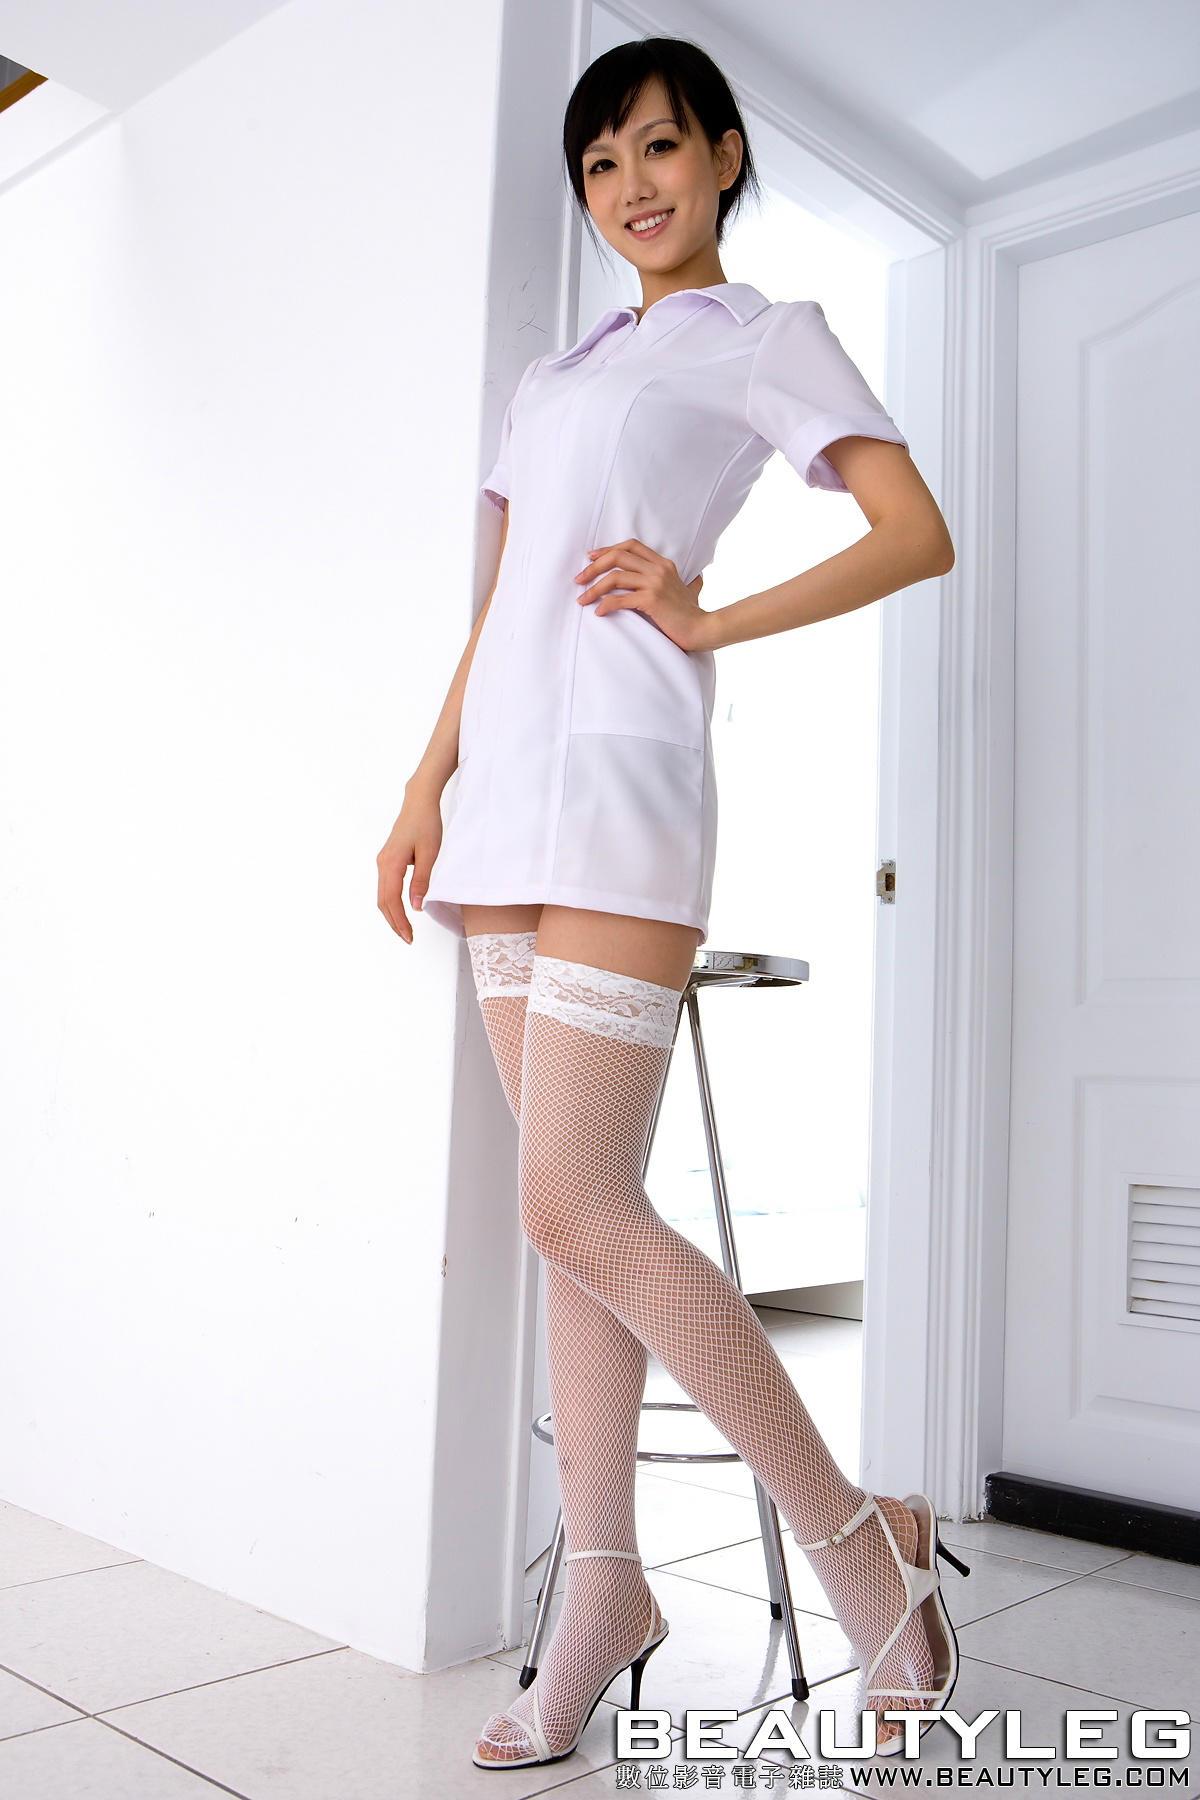 beautyleg清纯白色衬衫白色丝袜美女诱惑